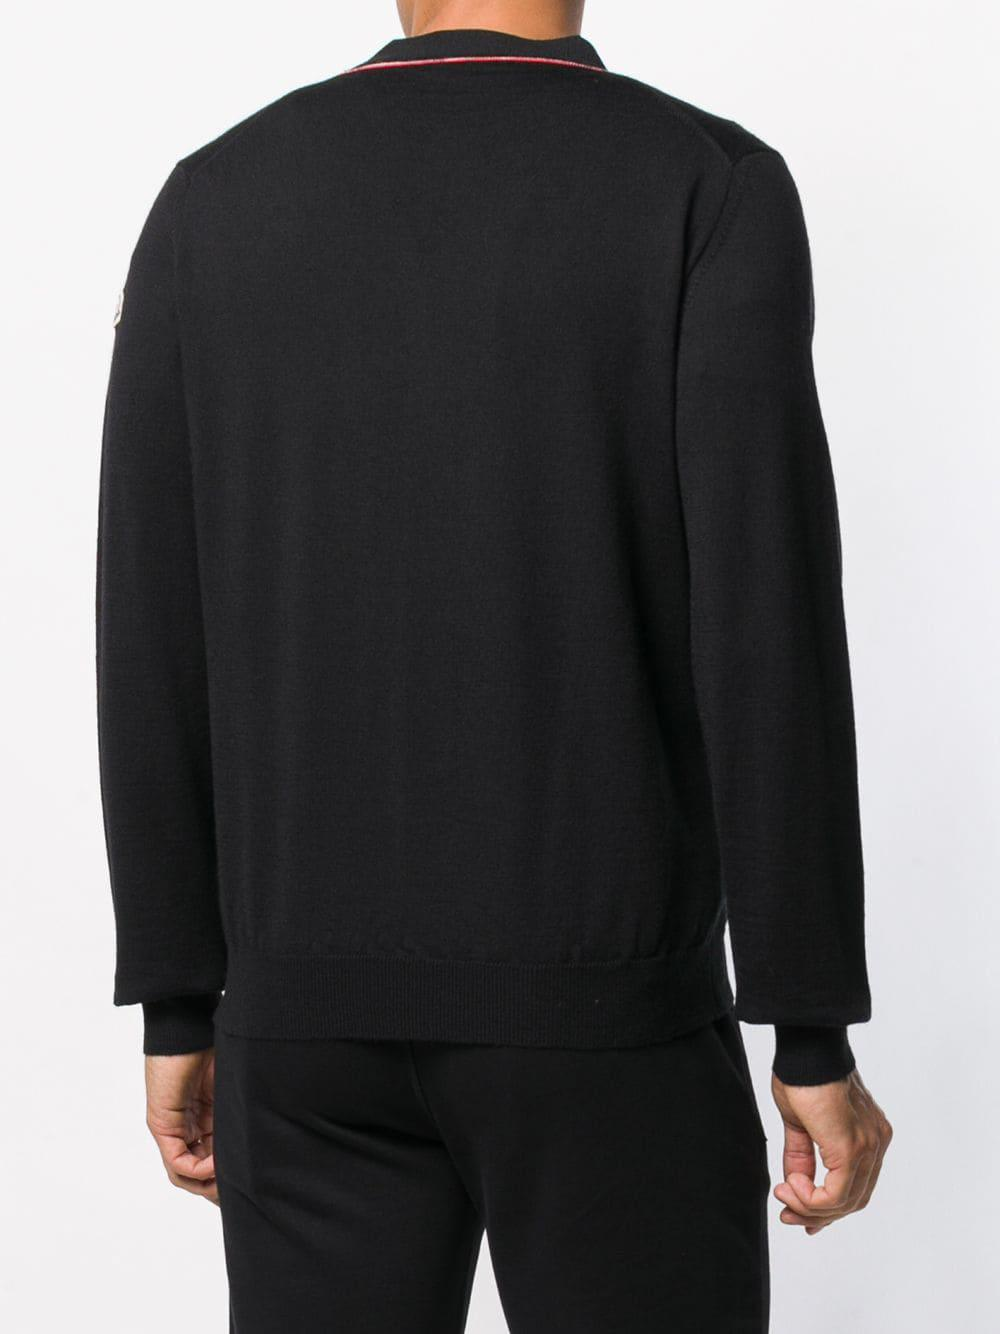 bed9f60d72 Moncler Long Sleeve Cardigan in Black for Men - Lyst